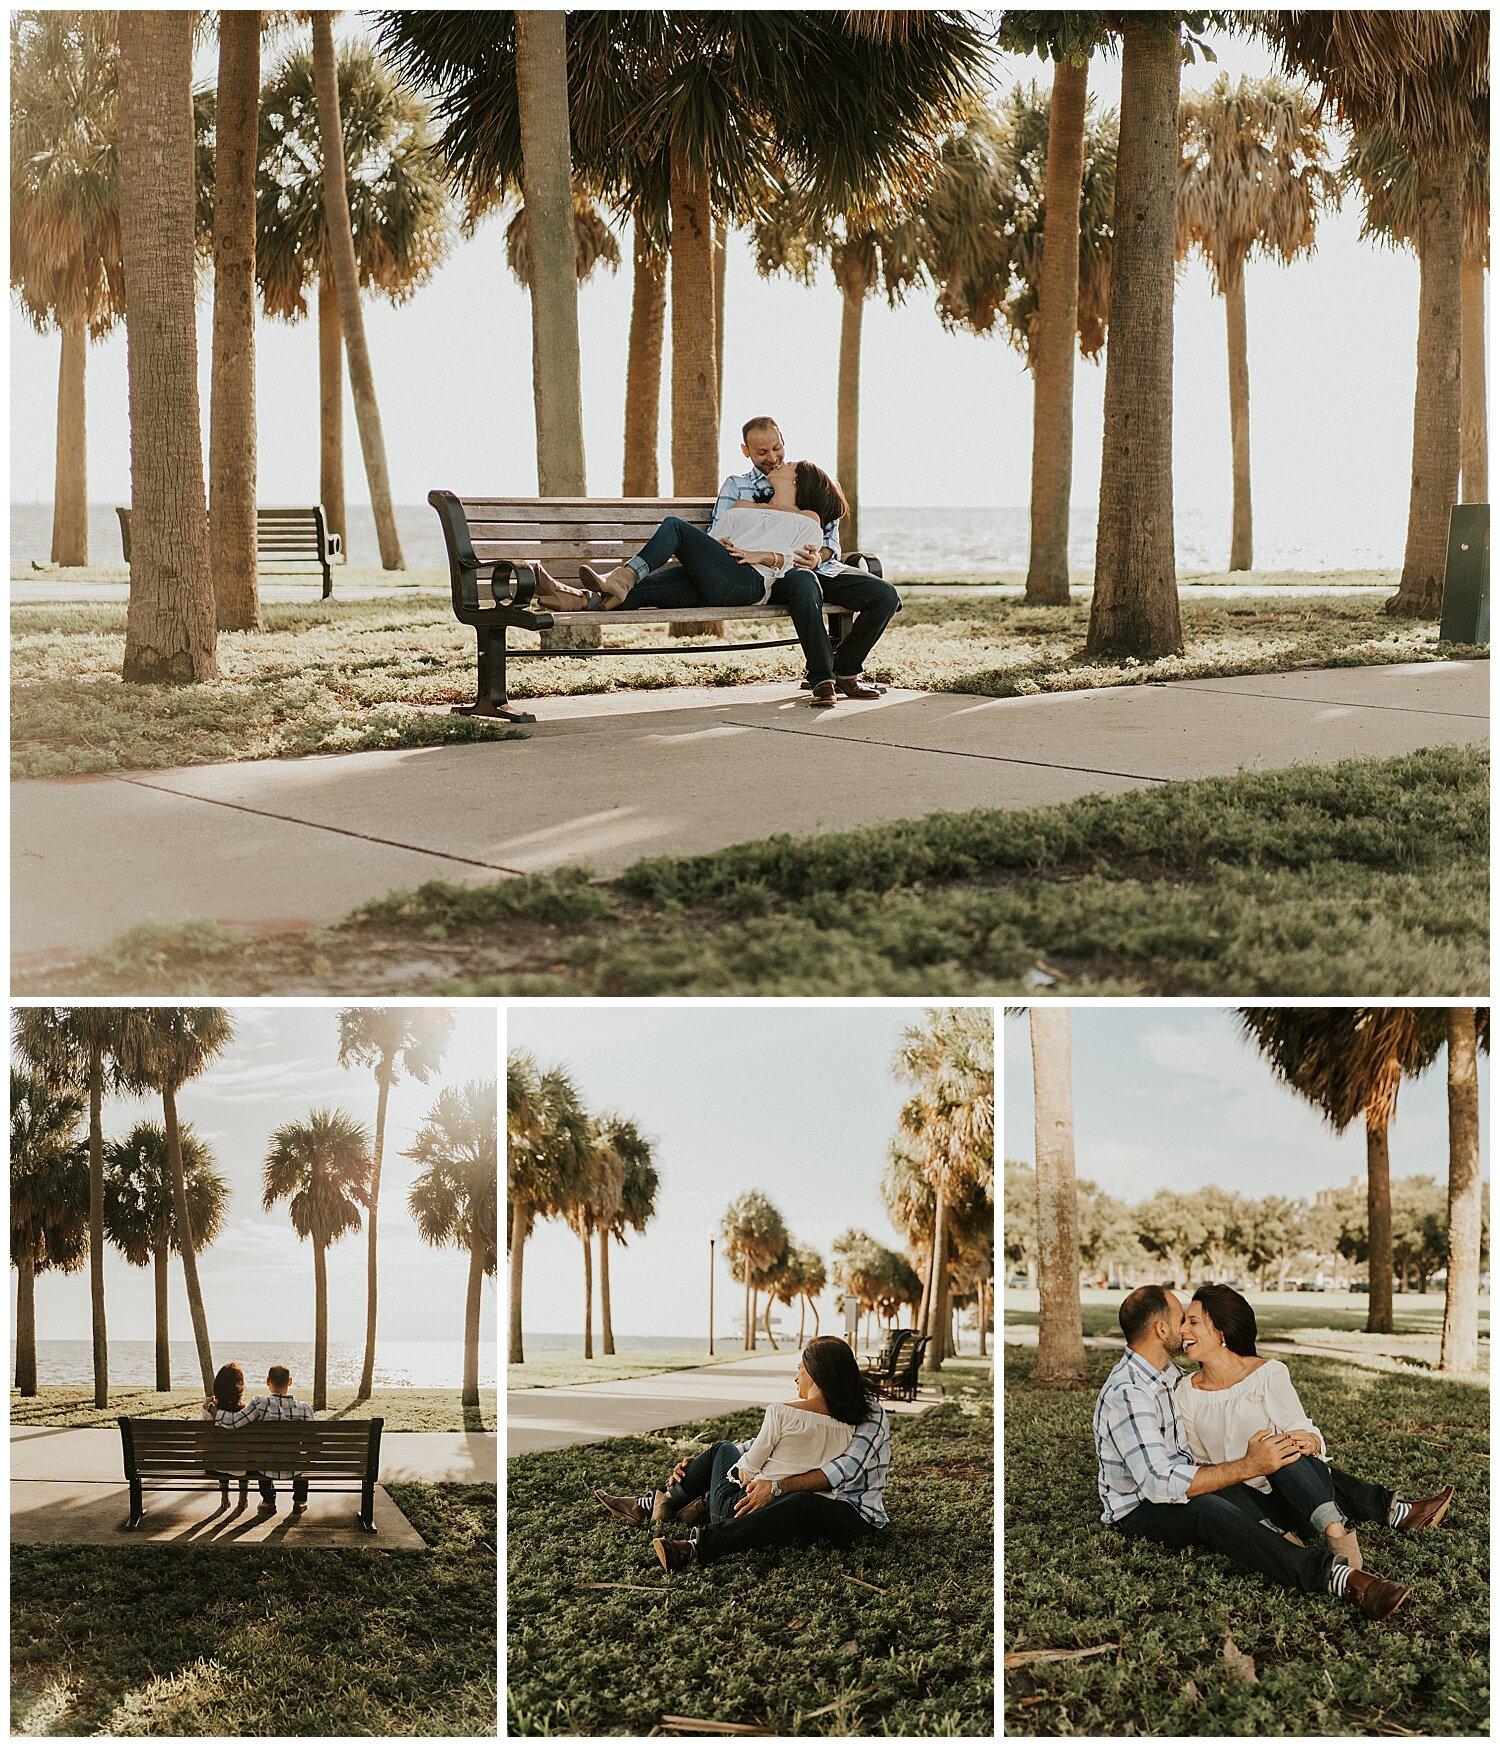 florida-wedding-photographer-tampa-engagement-photographer-st.pete-engagement-photographer-lens-culture-photographer-11.jpg